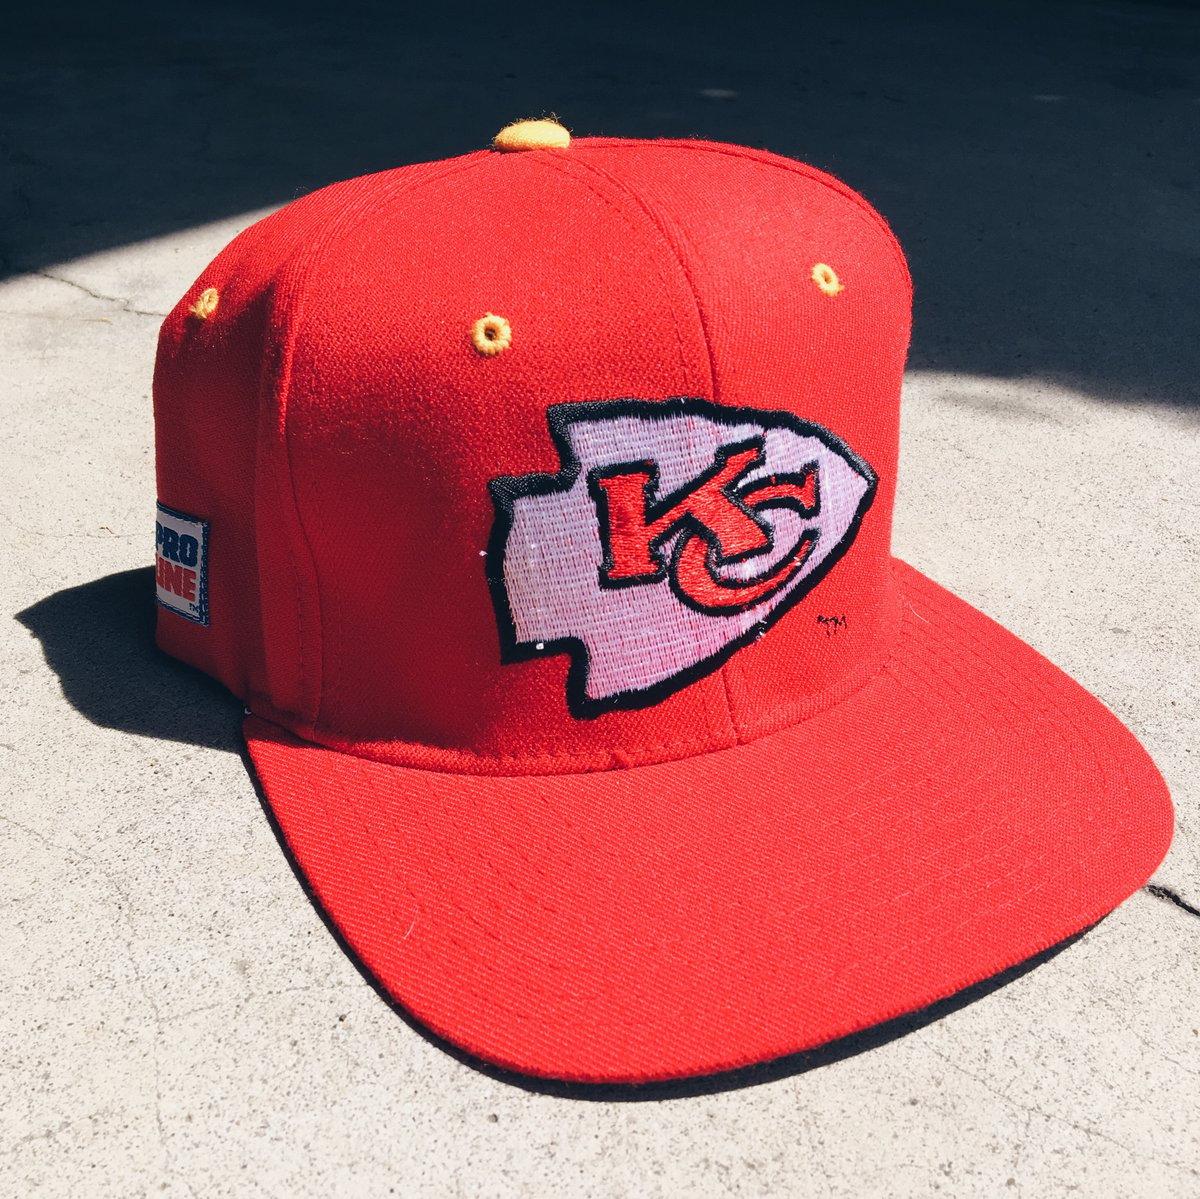 Image of Original 90's Starter Kansas City Chiefs Elastic-back Hat.